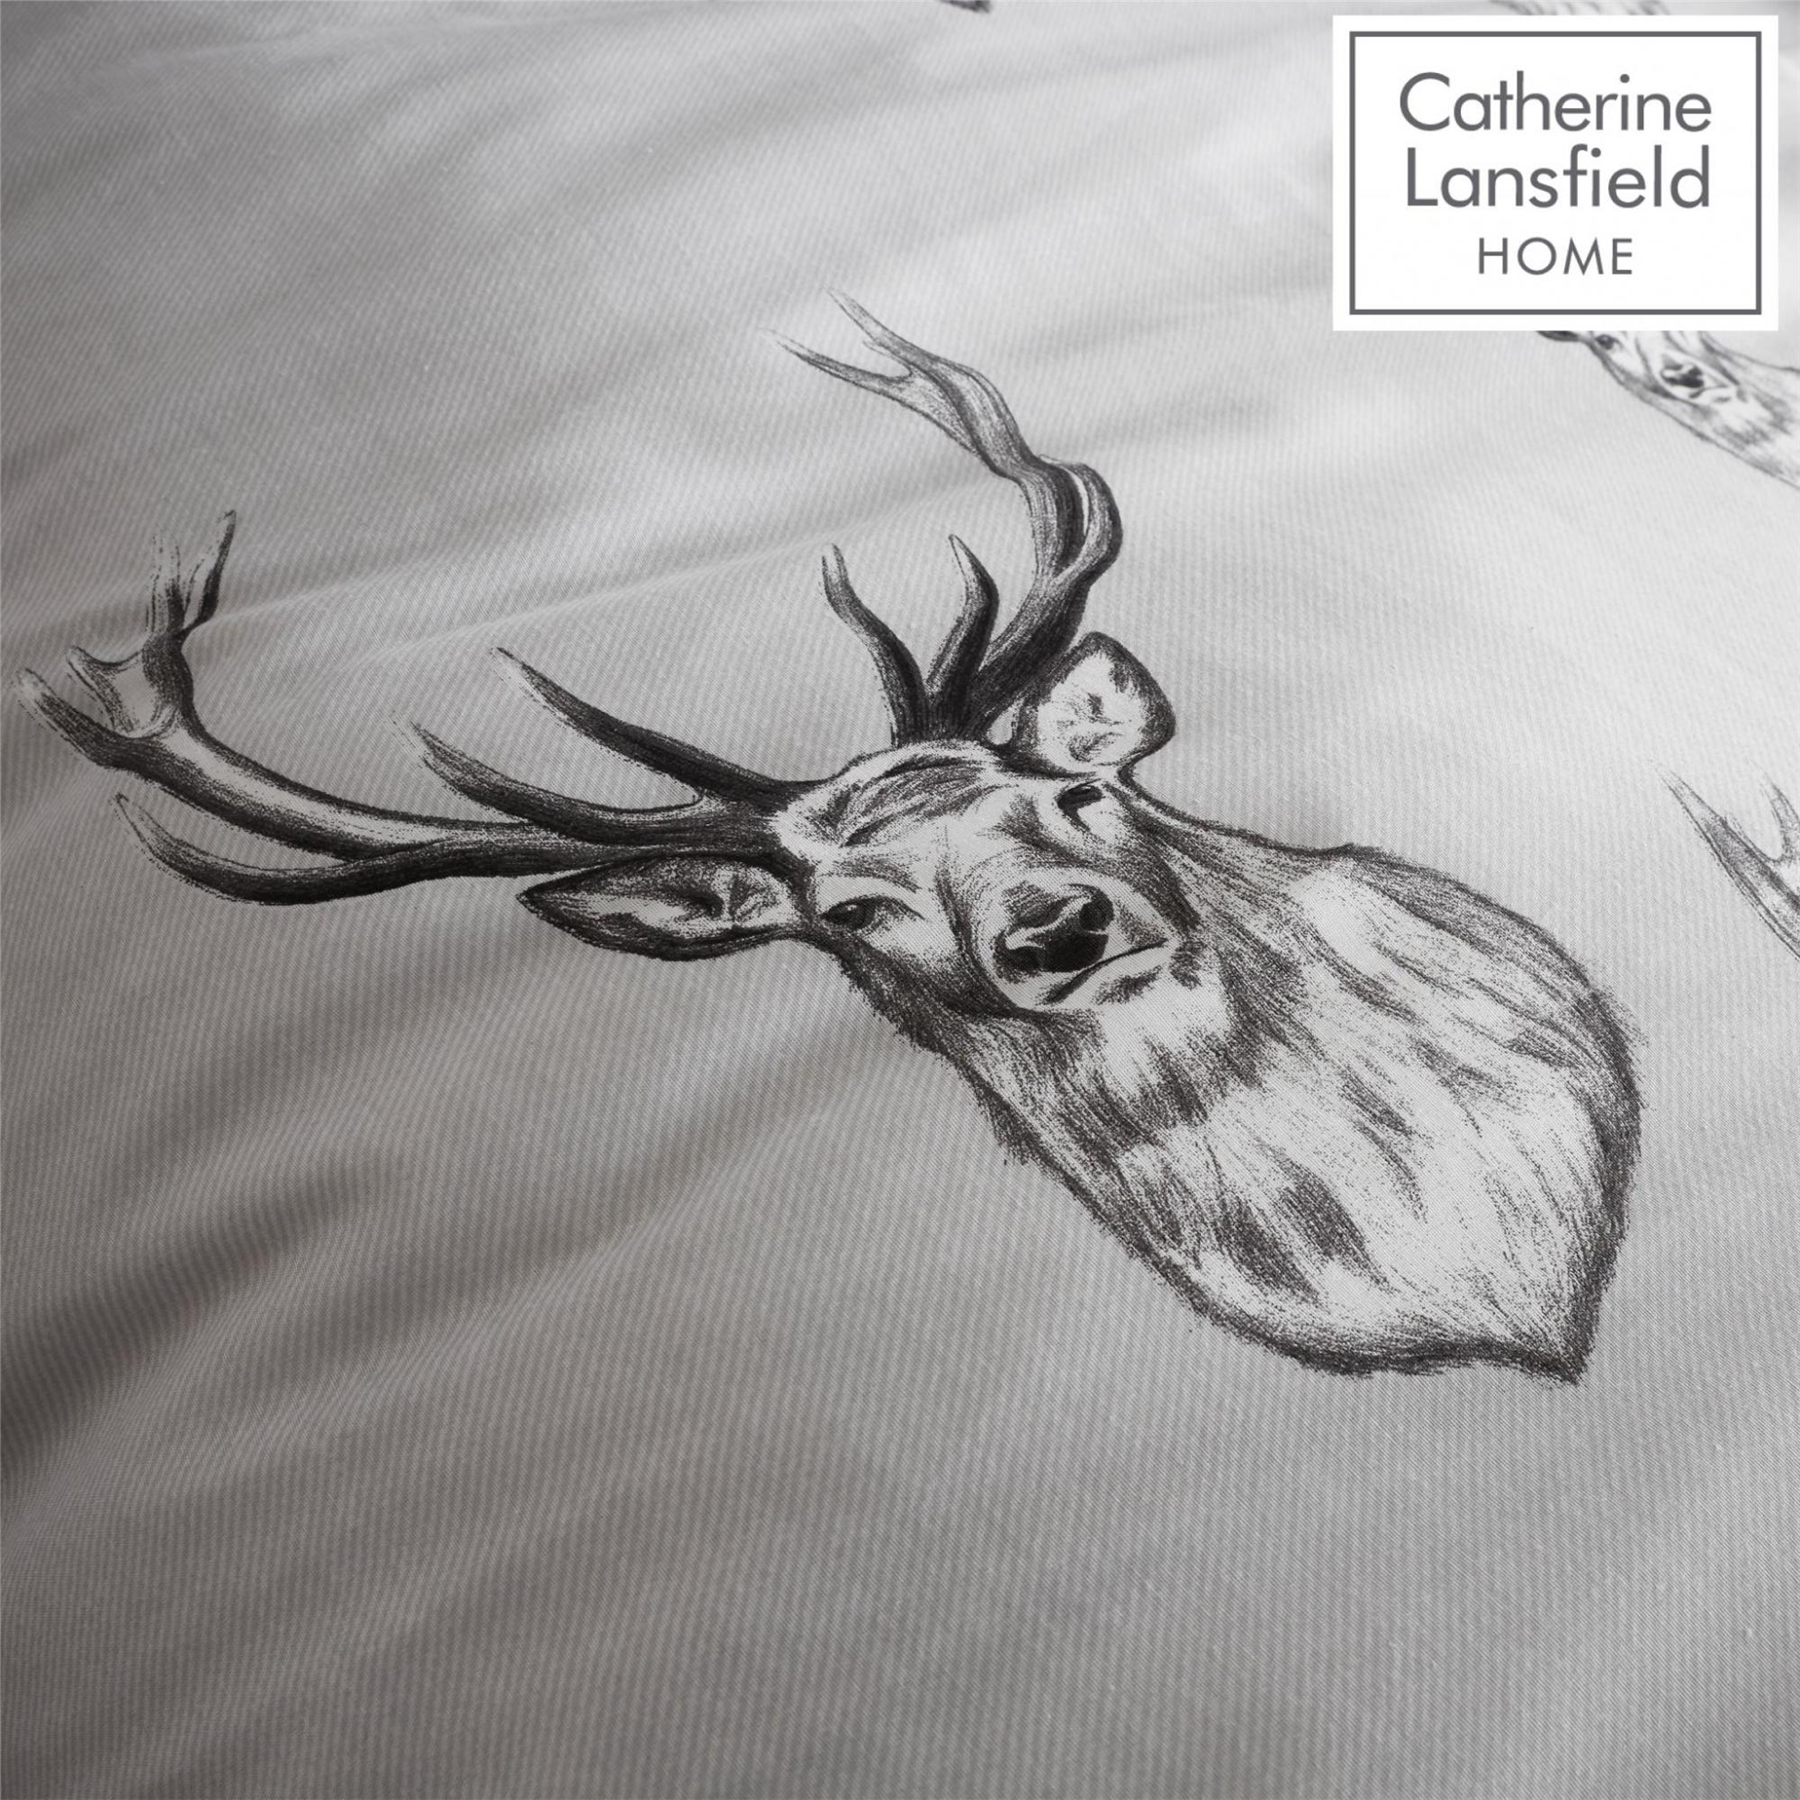 Catherine-Lansfield-Duvet-Set-Highland-Stag-Reversible-Check-Bedding-Grey thumbnail 15